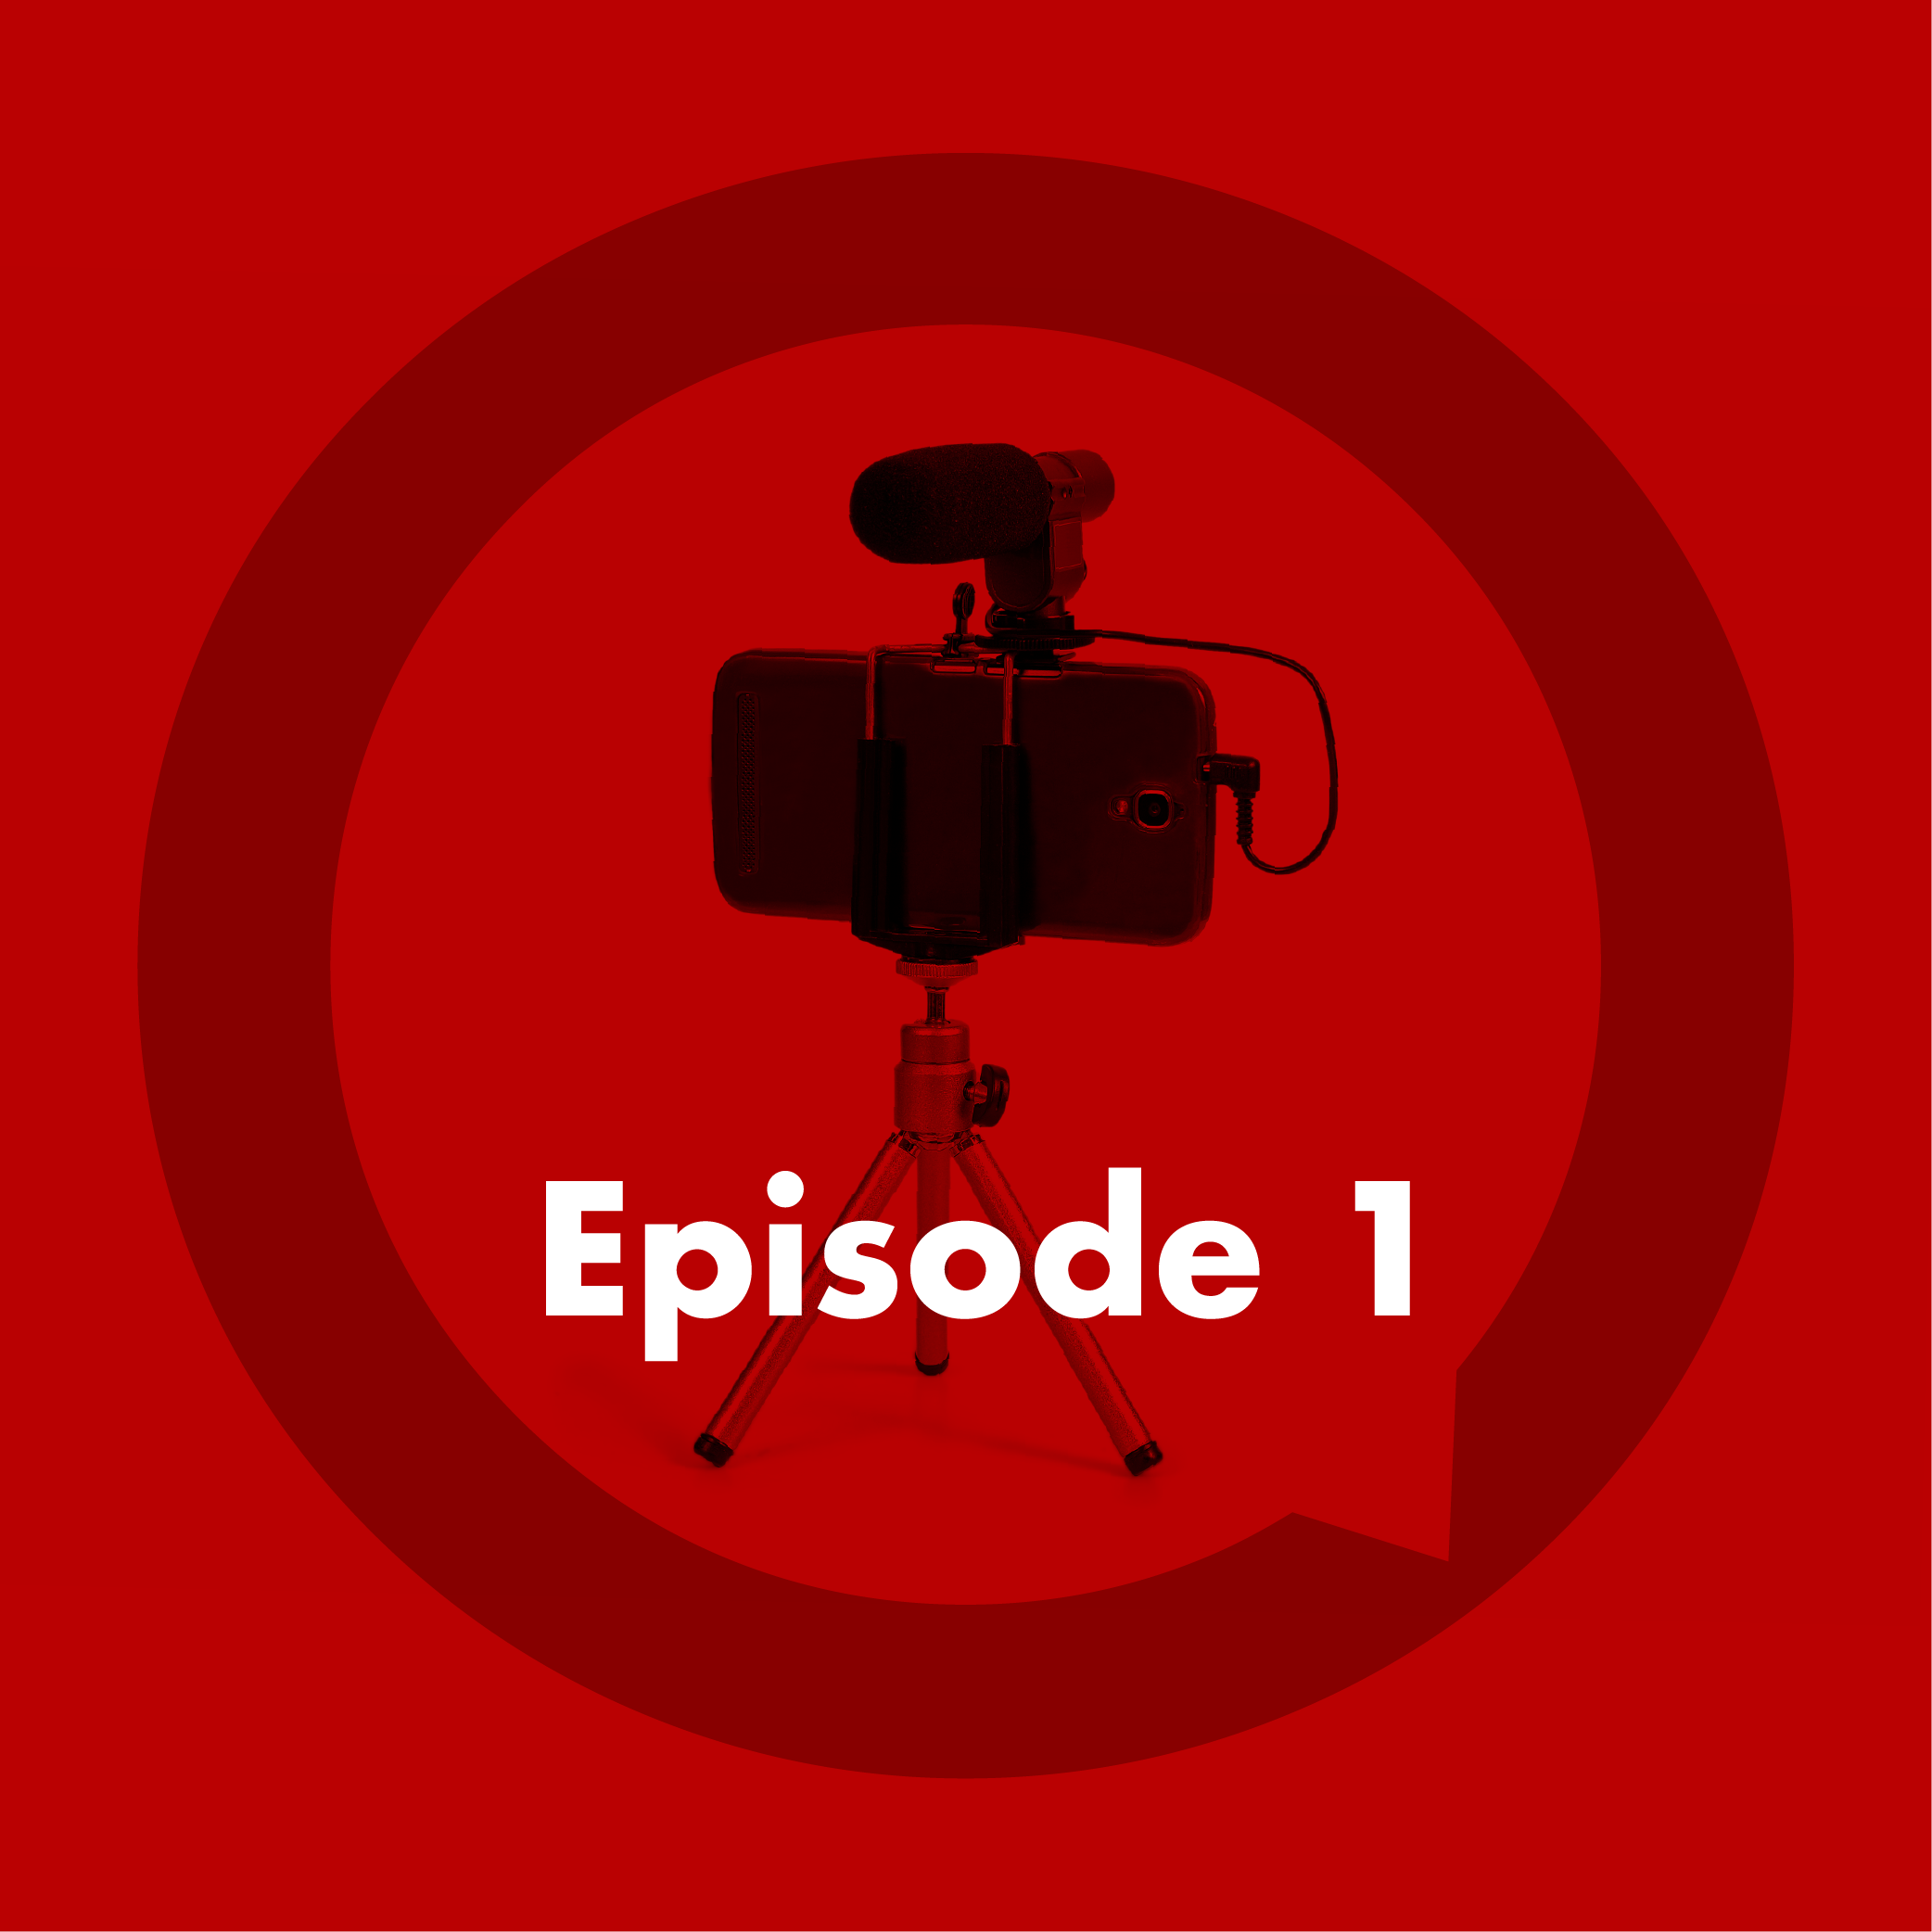 Live episodes